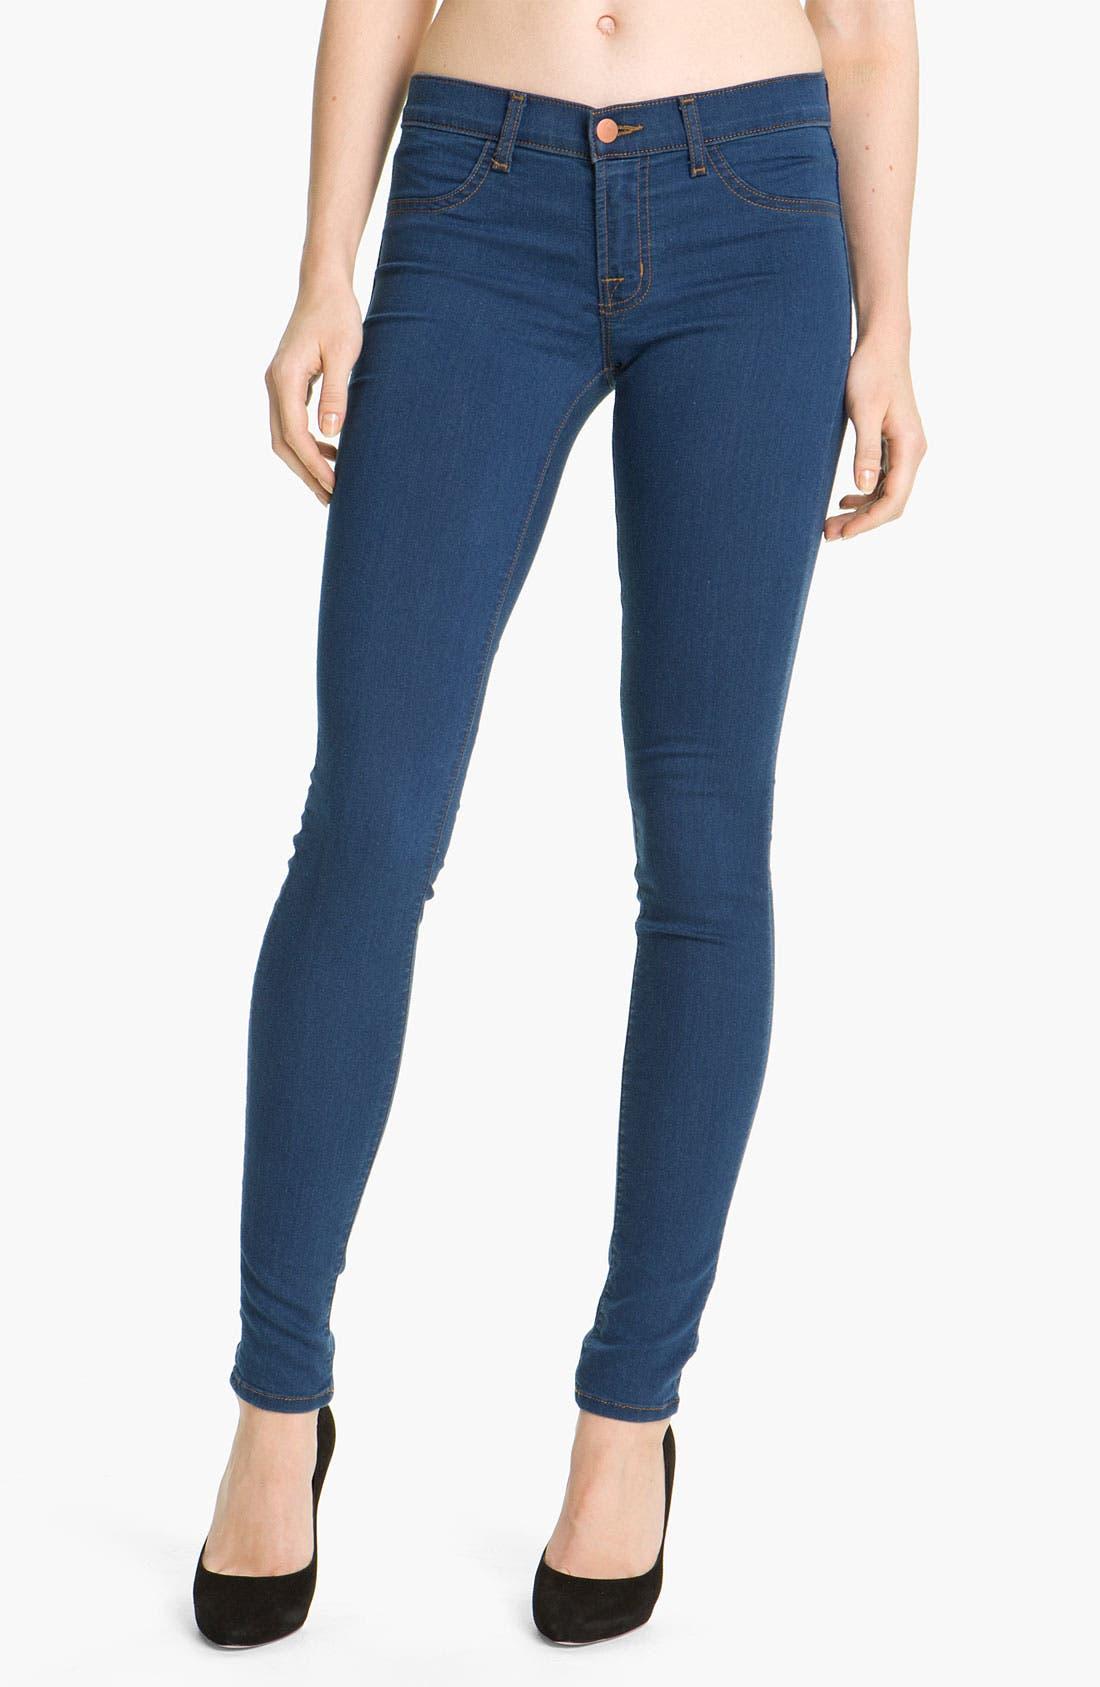 Alternate Image 1 Selected - J Brand 'Legging' Stretch Jeans (Salton)